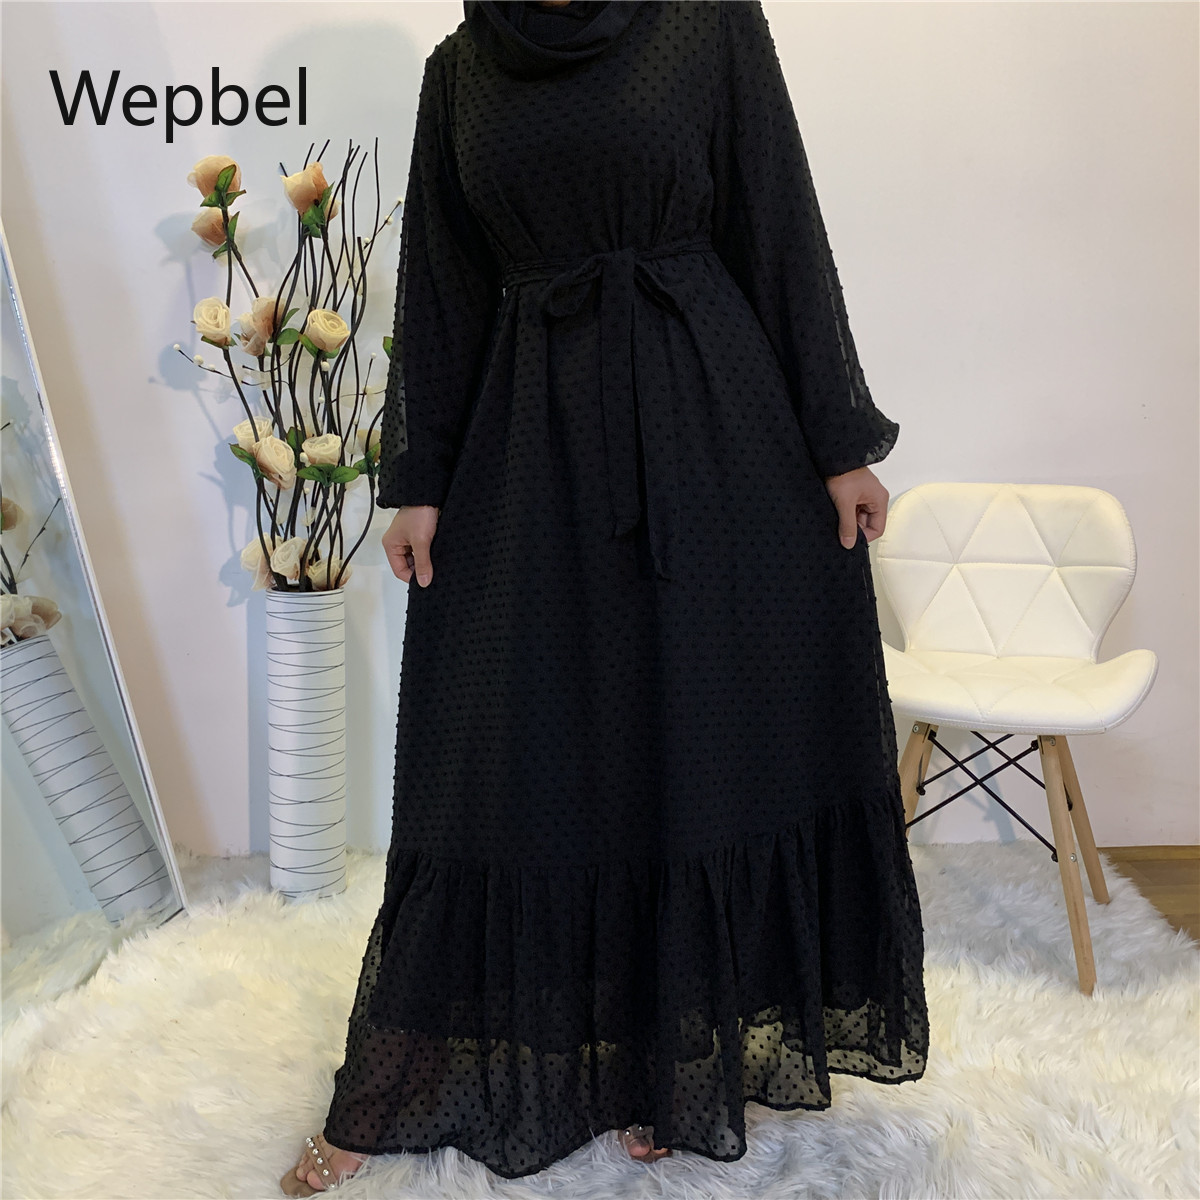 WEPBEL Long Sleeve Middle East Abays Plus Size Women Muslim Dress Panel Fashion High Waist O-neck Big Swing Islamic Clothing